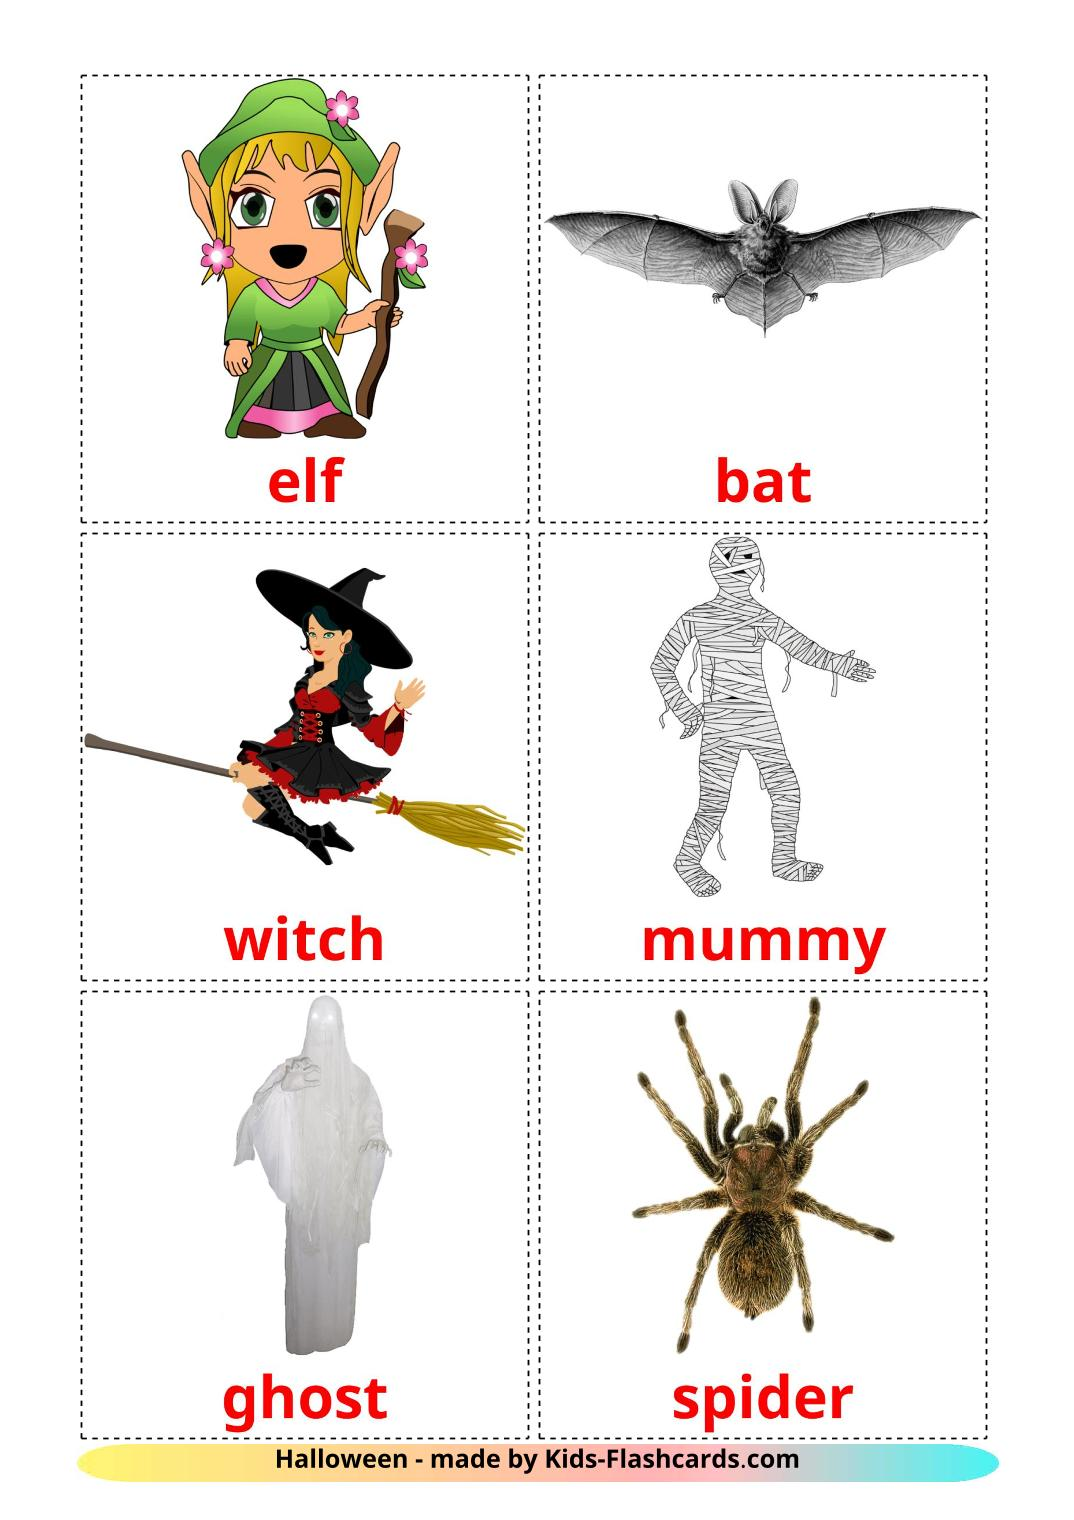 Halloween - 16 Free Printable english Flashcards